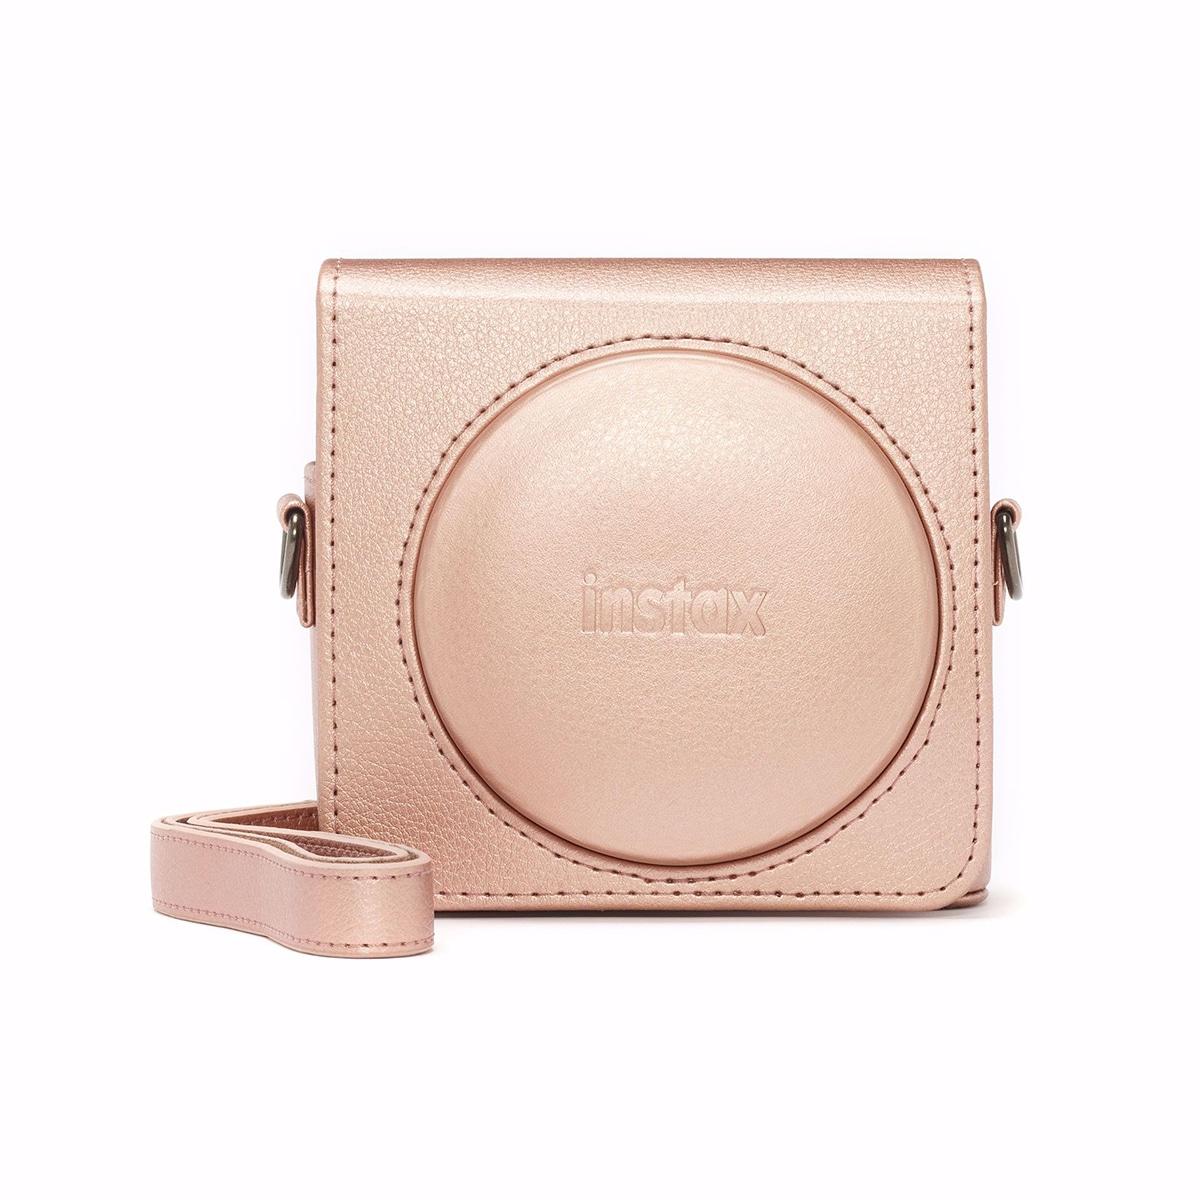 Fujifilm Instax Square 6 Väska Blush Gold